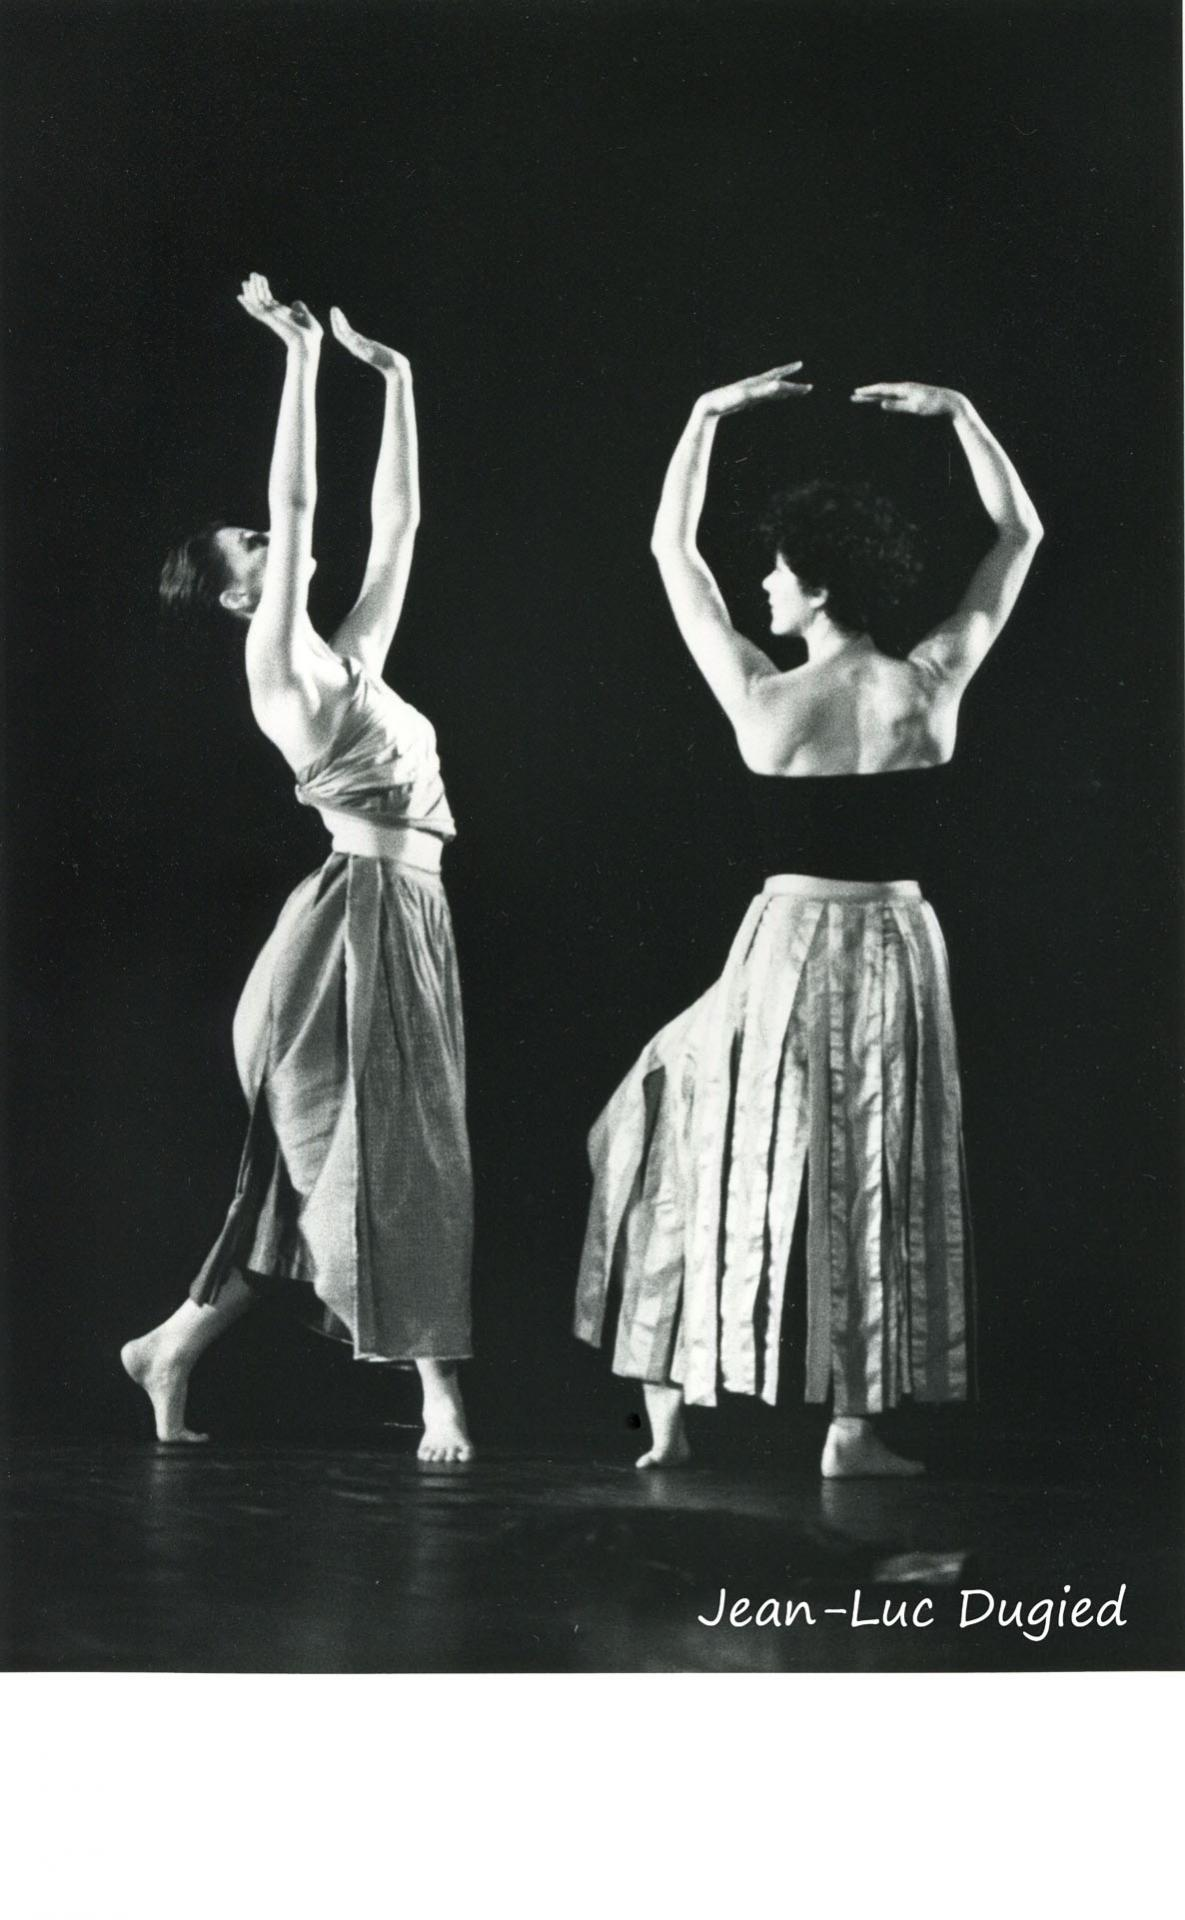 20 Dugied Fabrice - les zonards célestes - Marie Martin et Catherine Lika - 1987